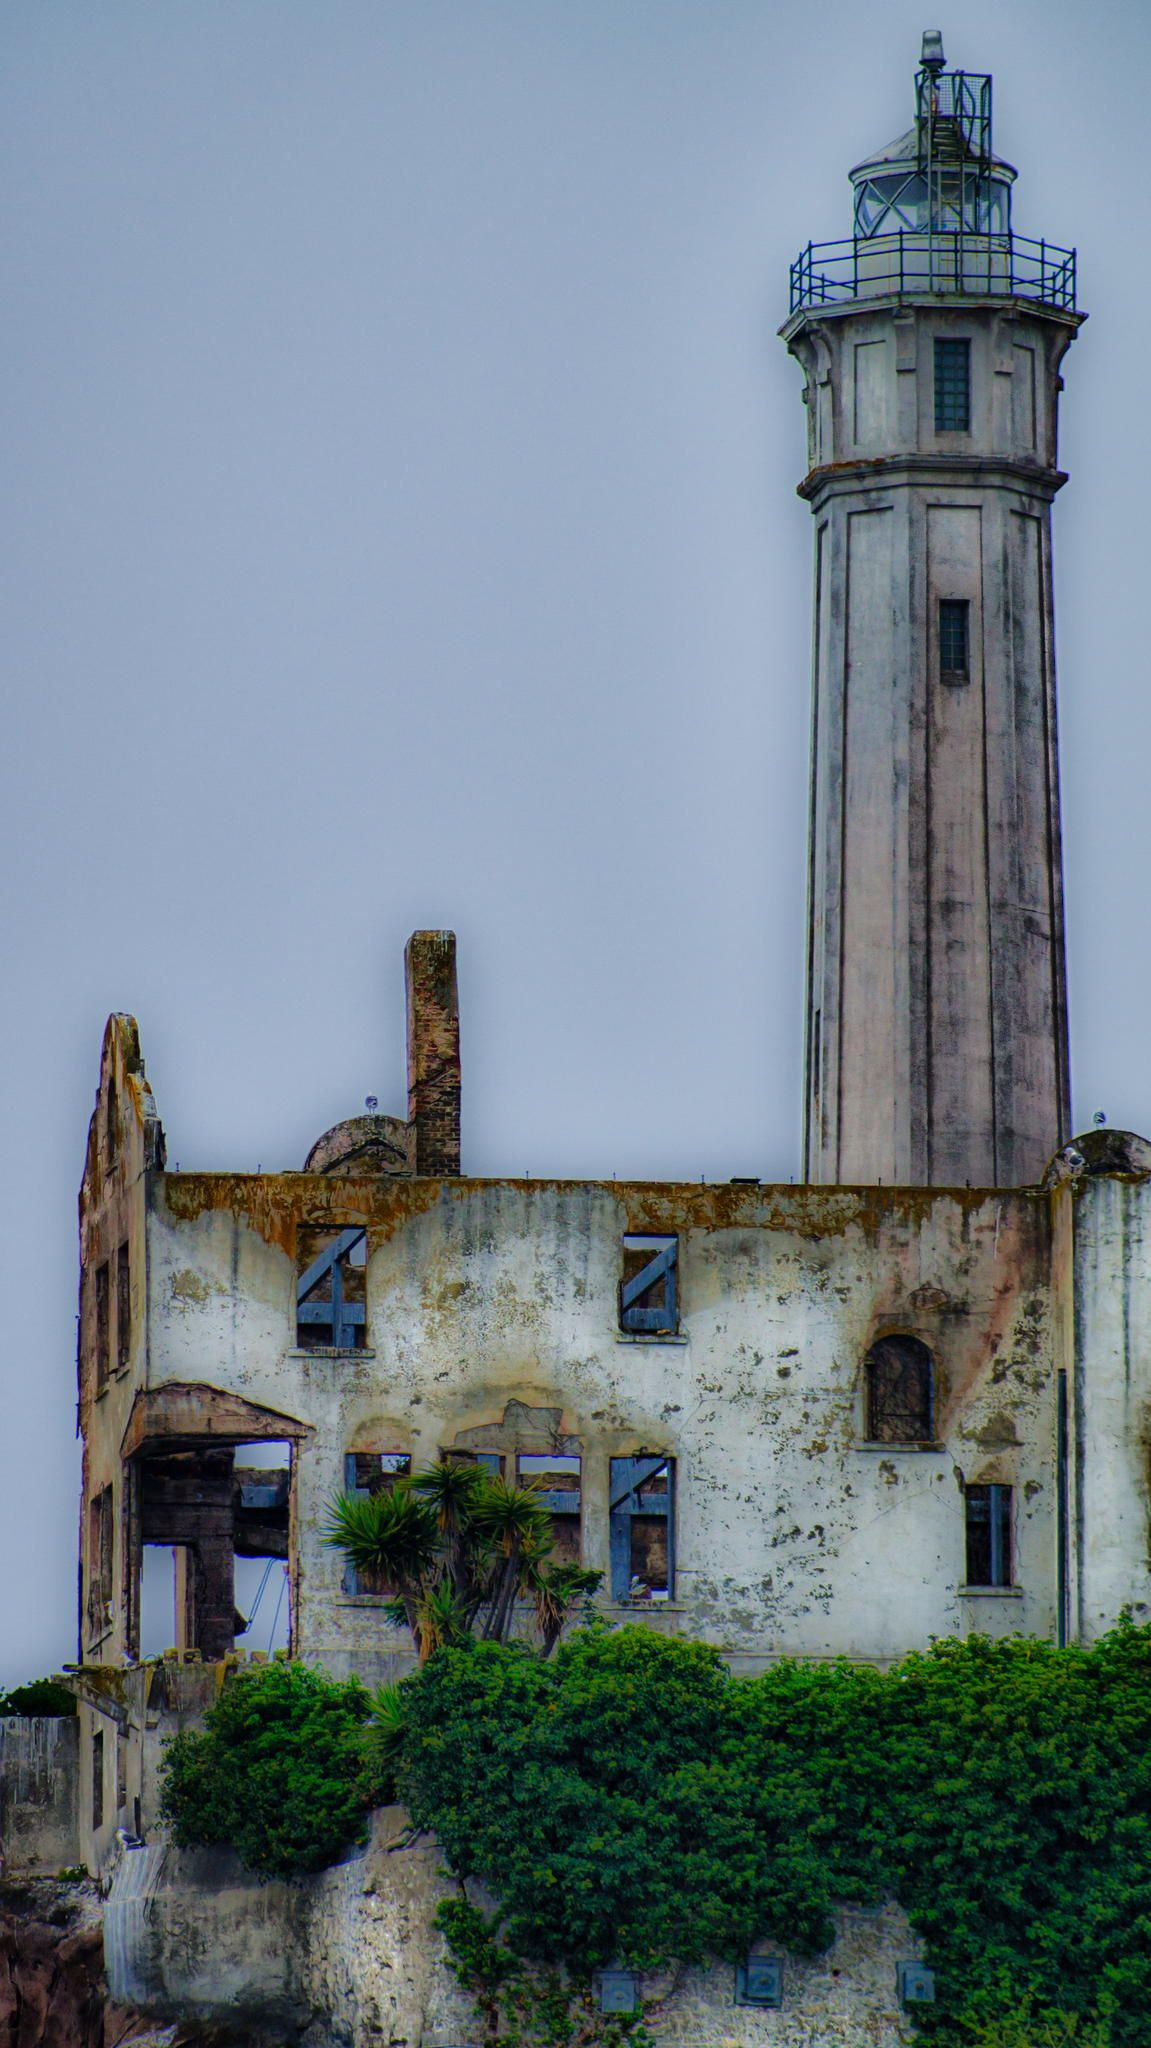 Light house and Wardens house on Alcatraz Island